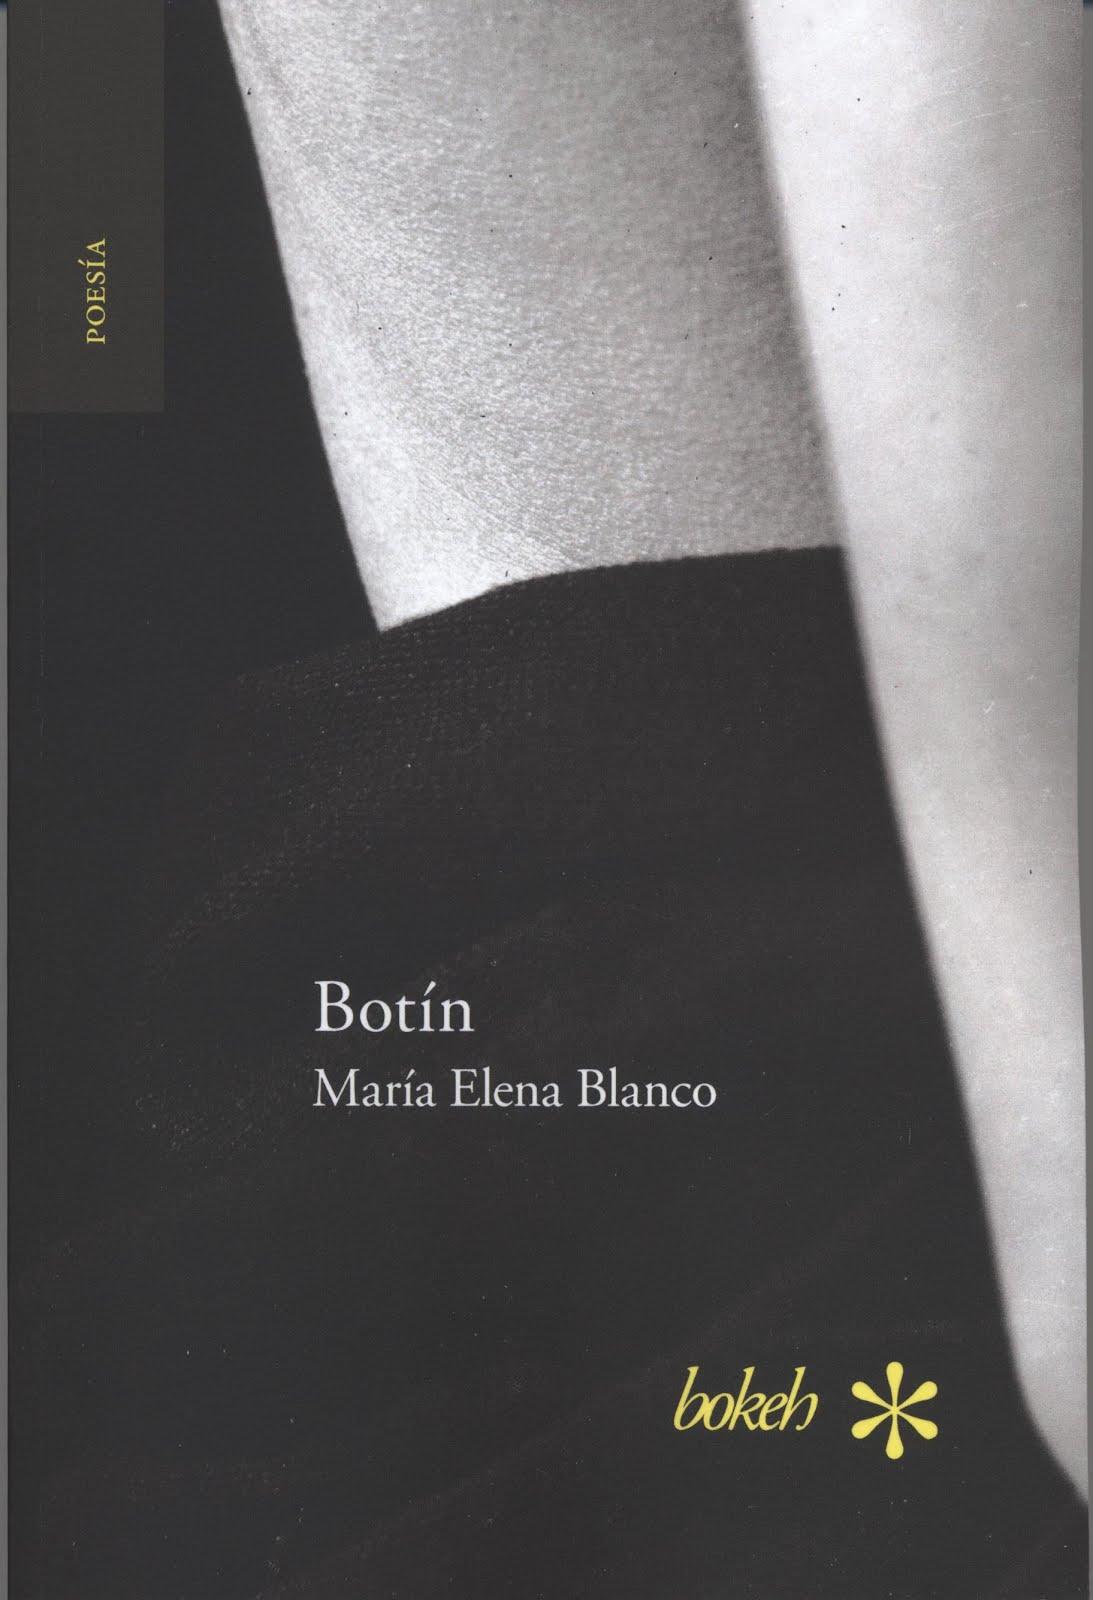 Botín. Antología personal 1986-2016 (Bokeh Press, Leiden, Países Bajos, 2016)